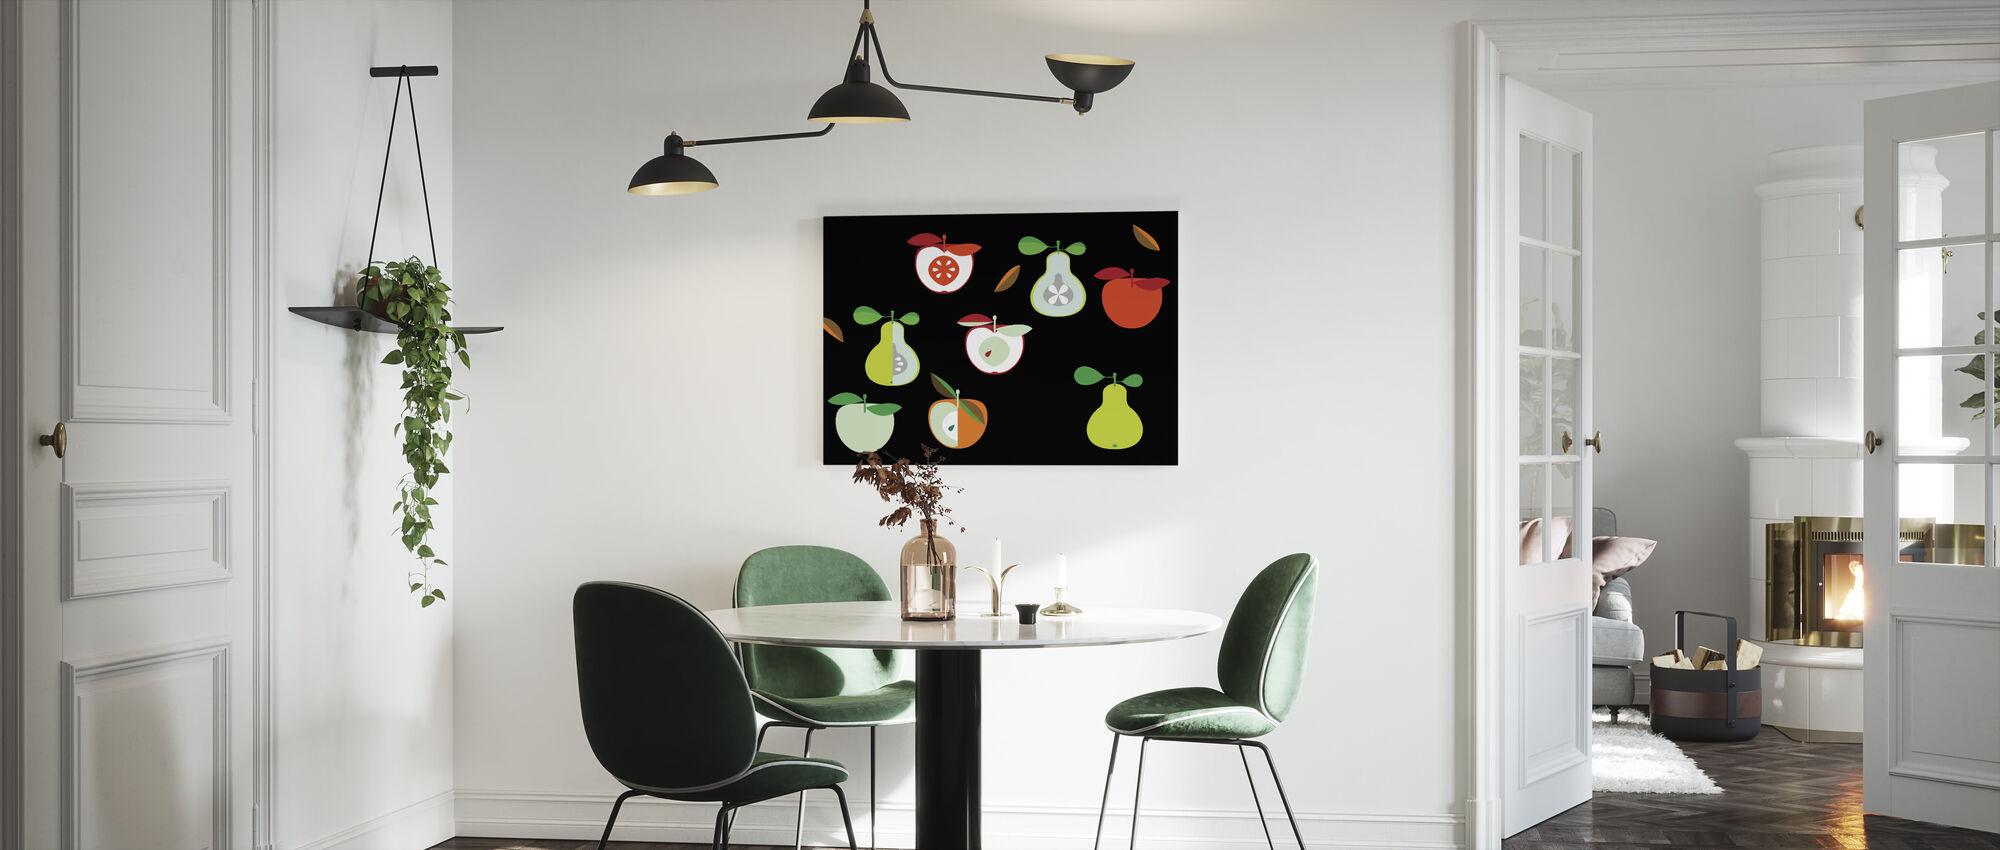 Kivik Apple and Pear - Canvas print - Kitchen